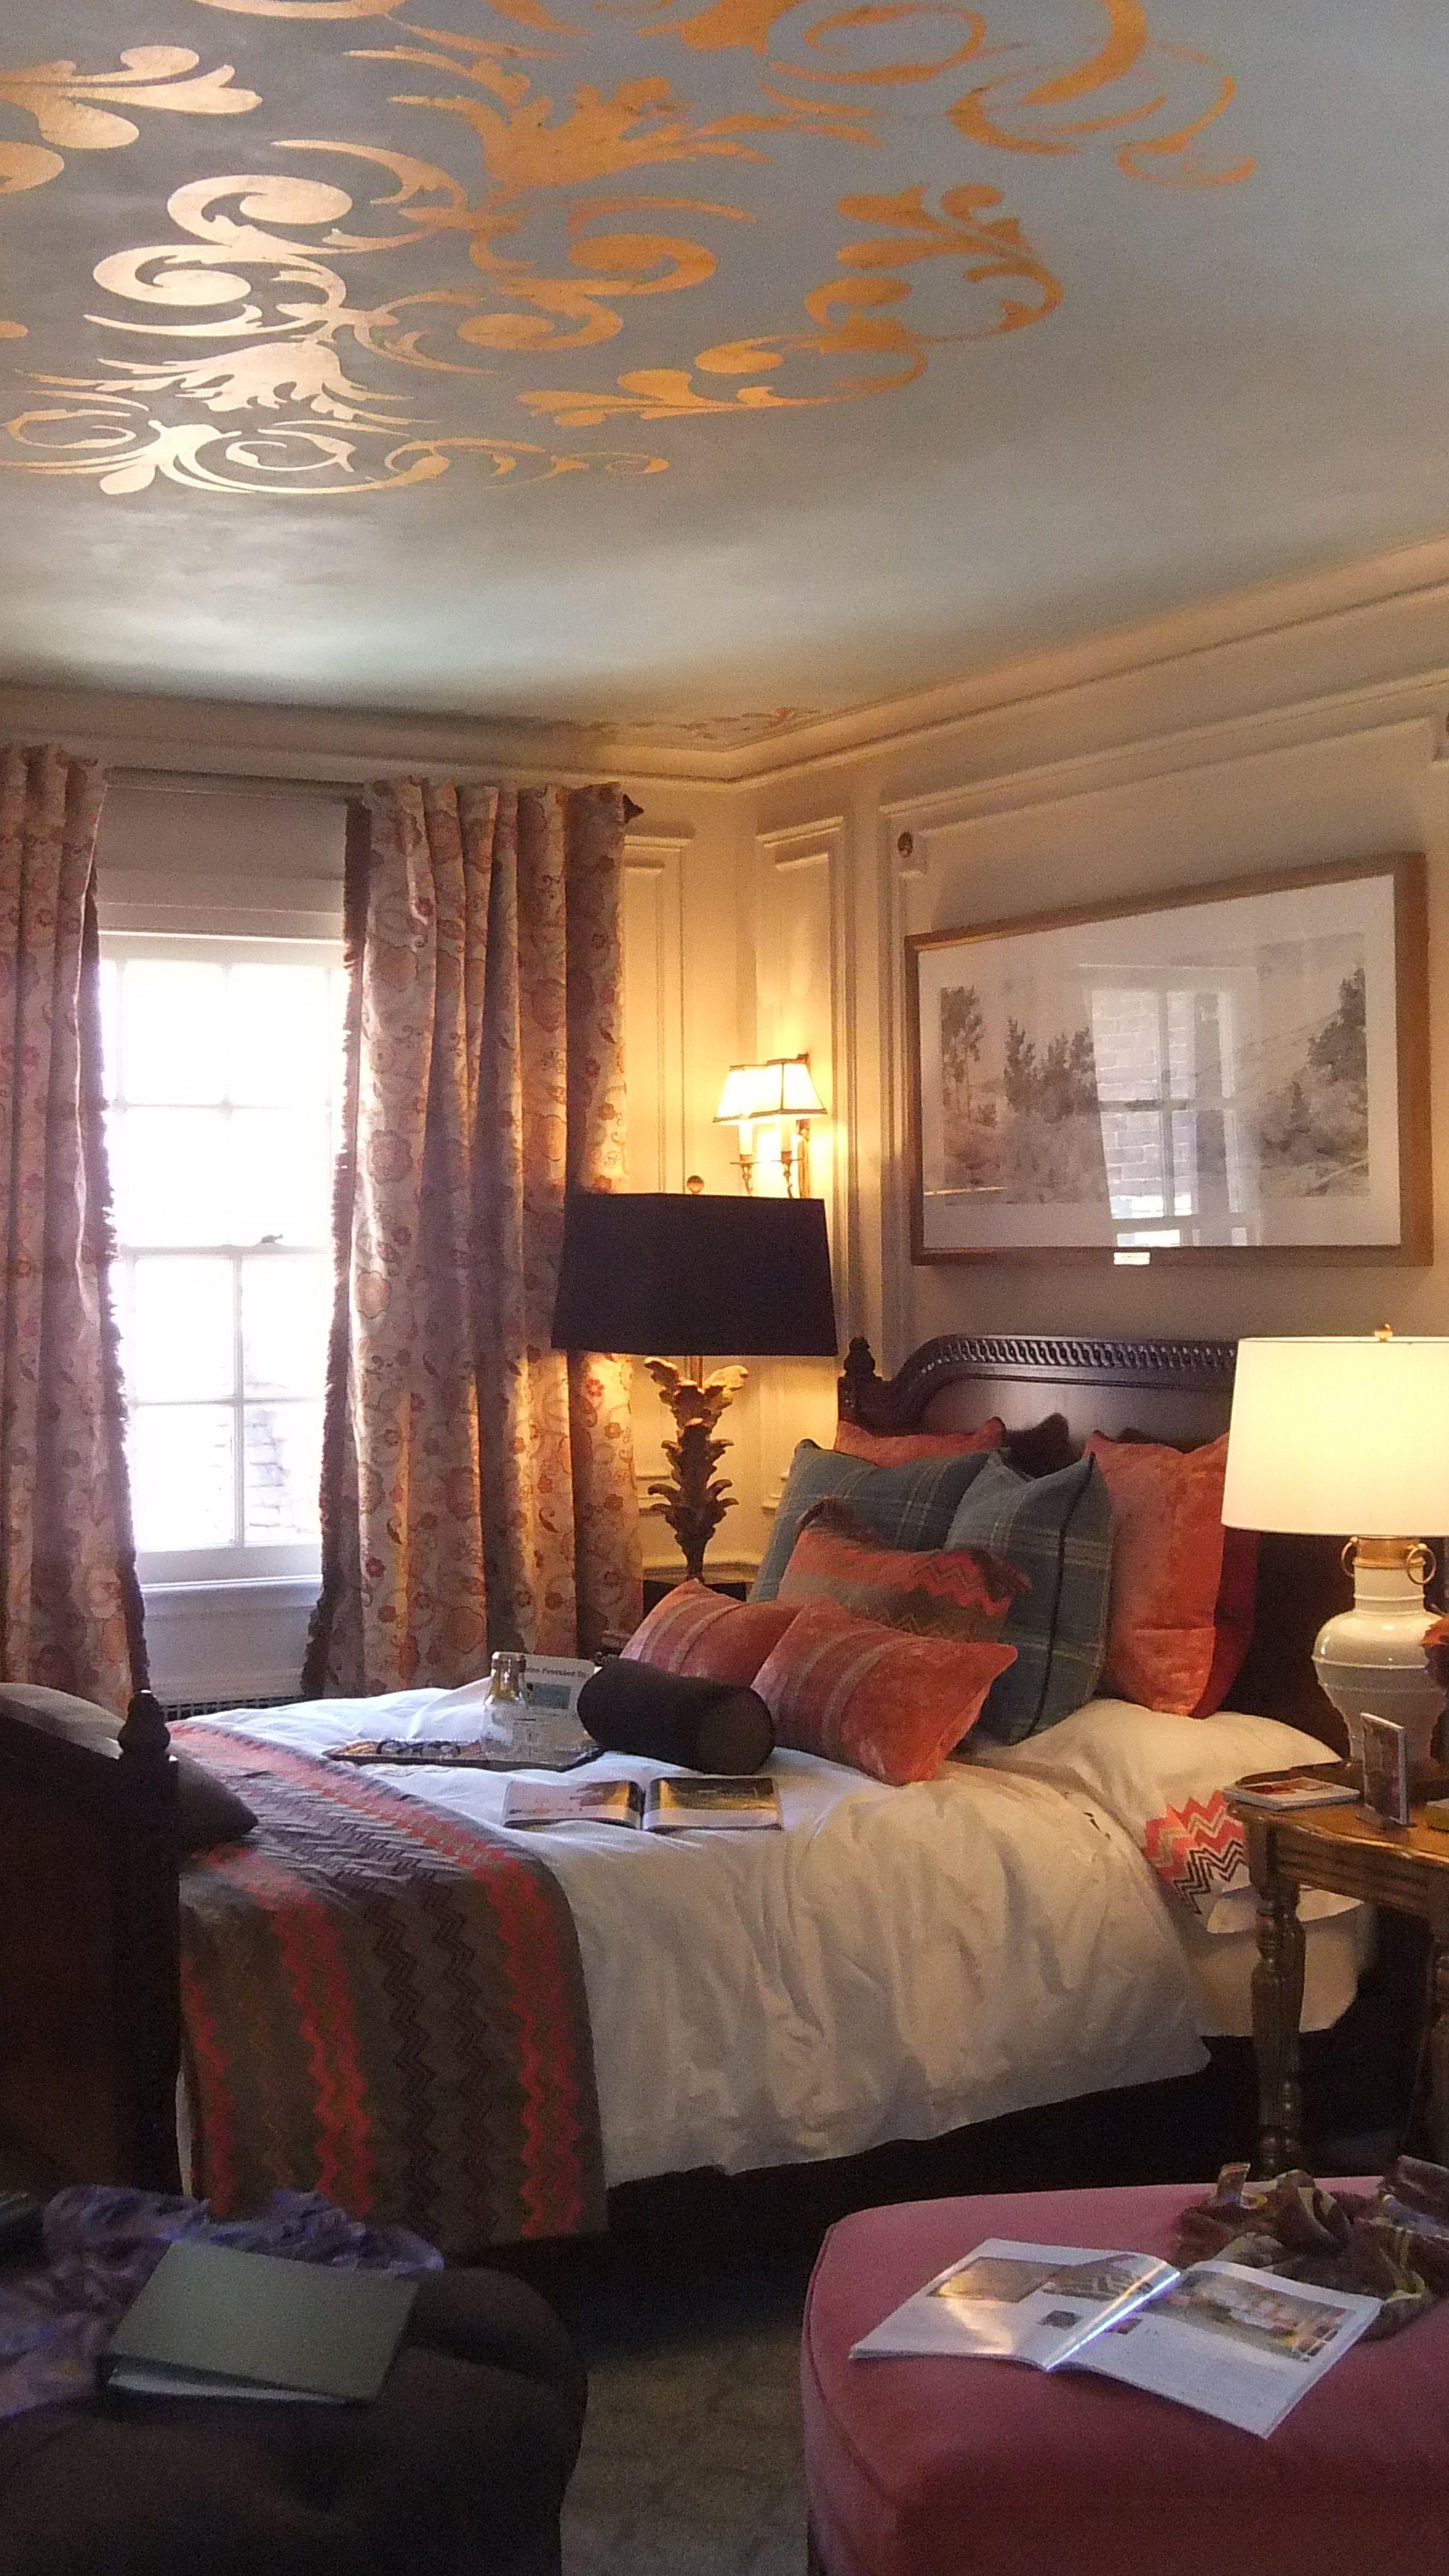 Adamsleigh guest room by debby gomulka room guest